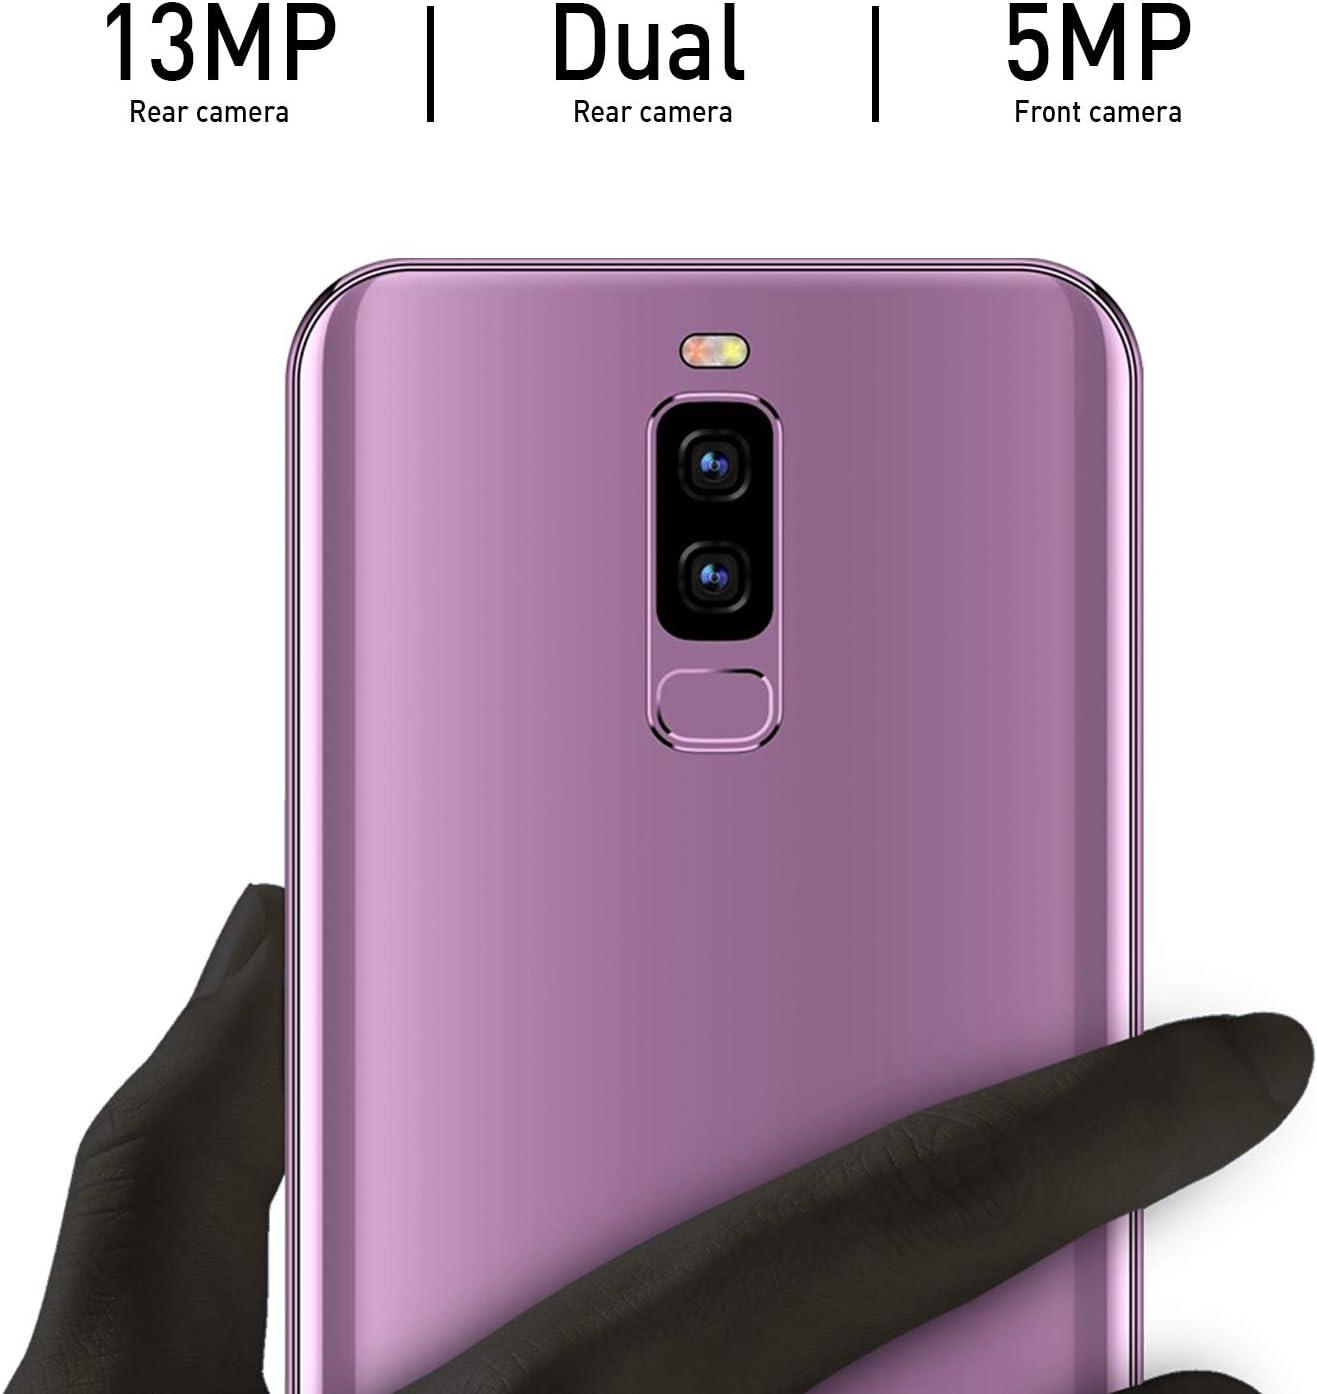 Moviles Libres Baratos 4G,S9 Pro 5,84 Pulgadas 16GB ROM 3GB RAM,4300mAh Bateria 13MP cámara, Teléfono Android 8.1 Quad-Core Dual SIM & Face ID Smartphone Baratos Libres(Púrpura): Amazon.es: Electrónica